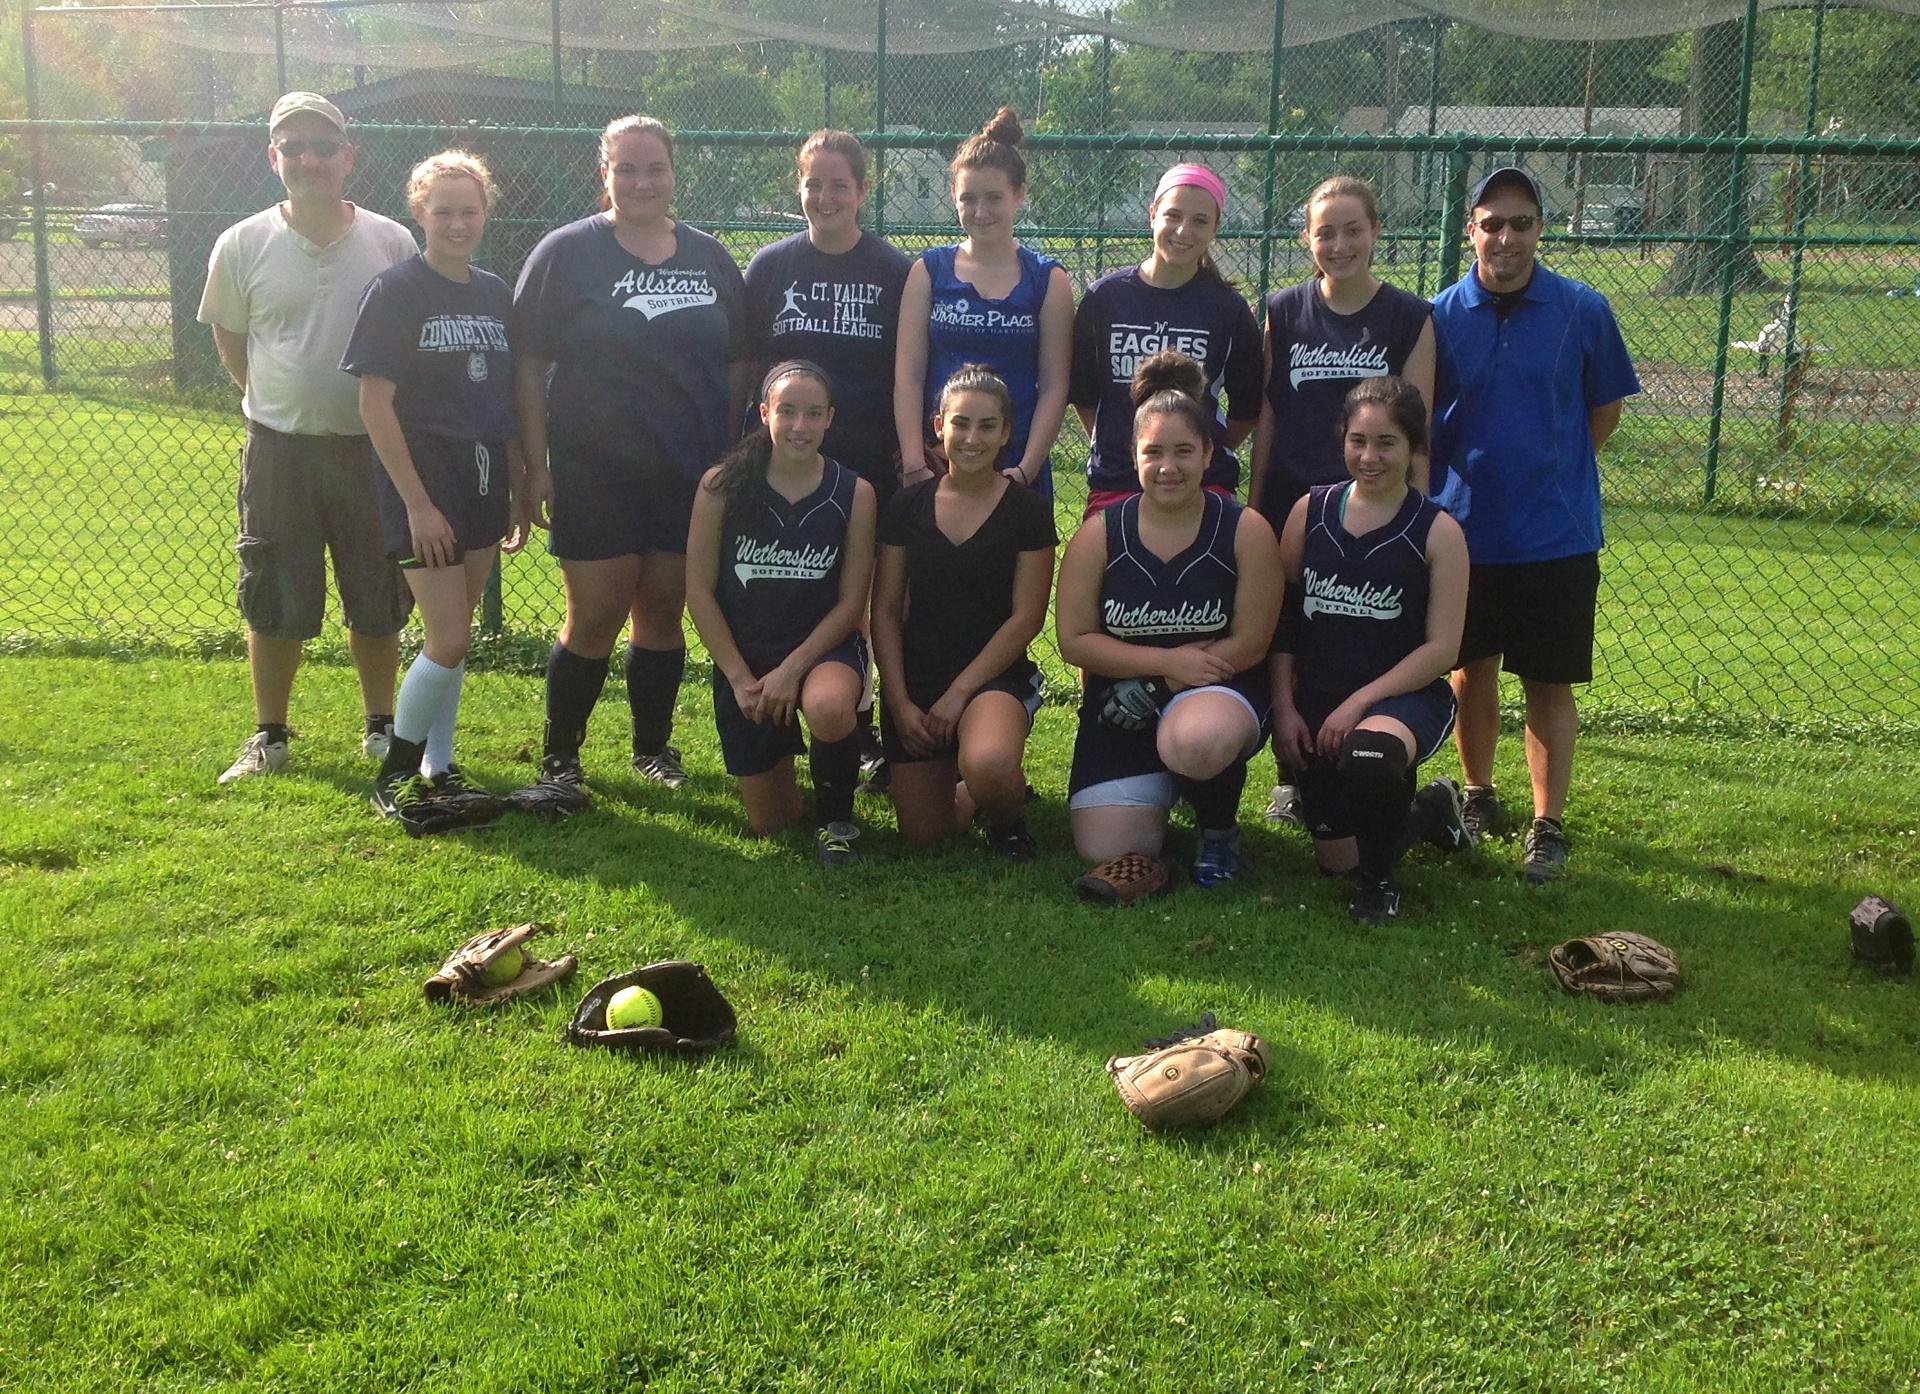 Wethersfield Team